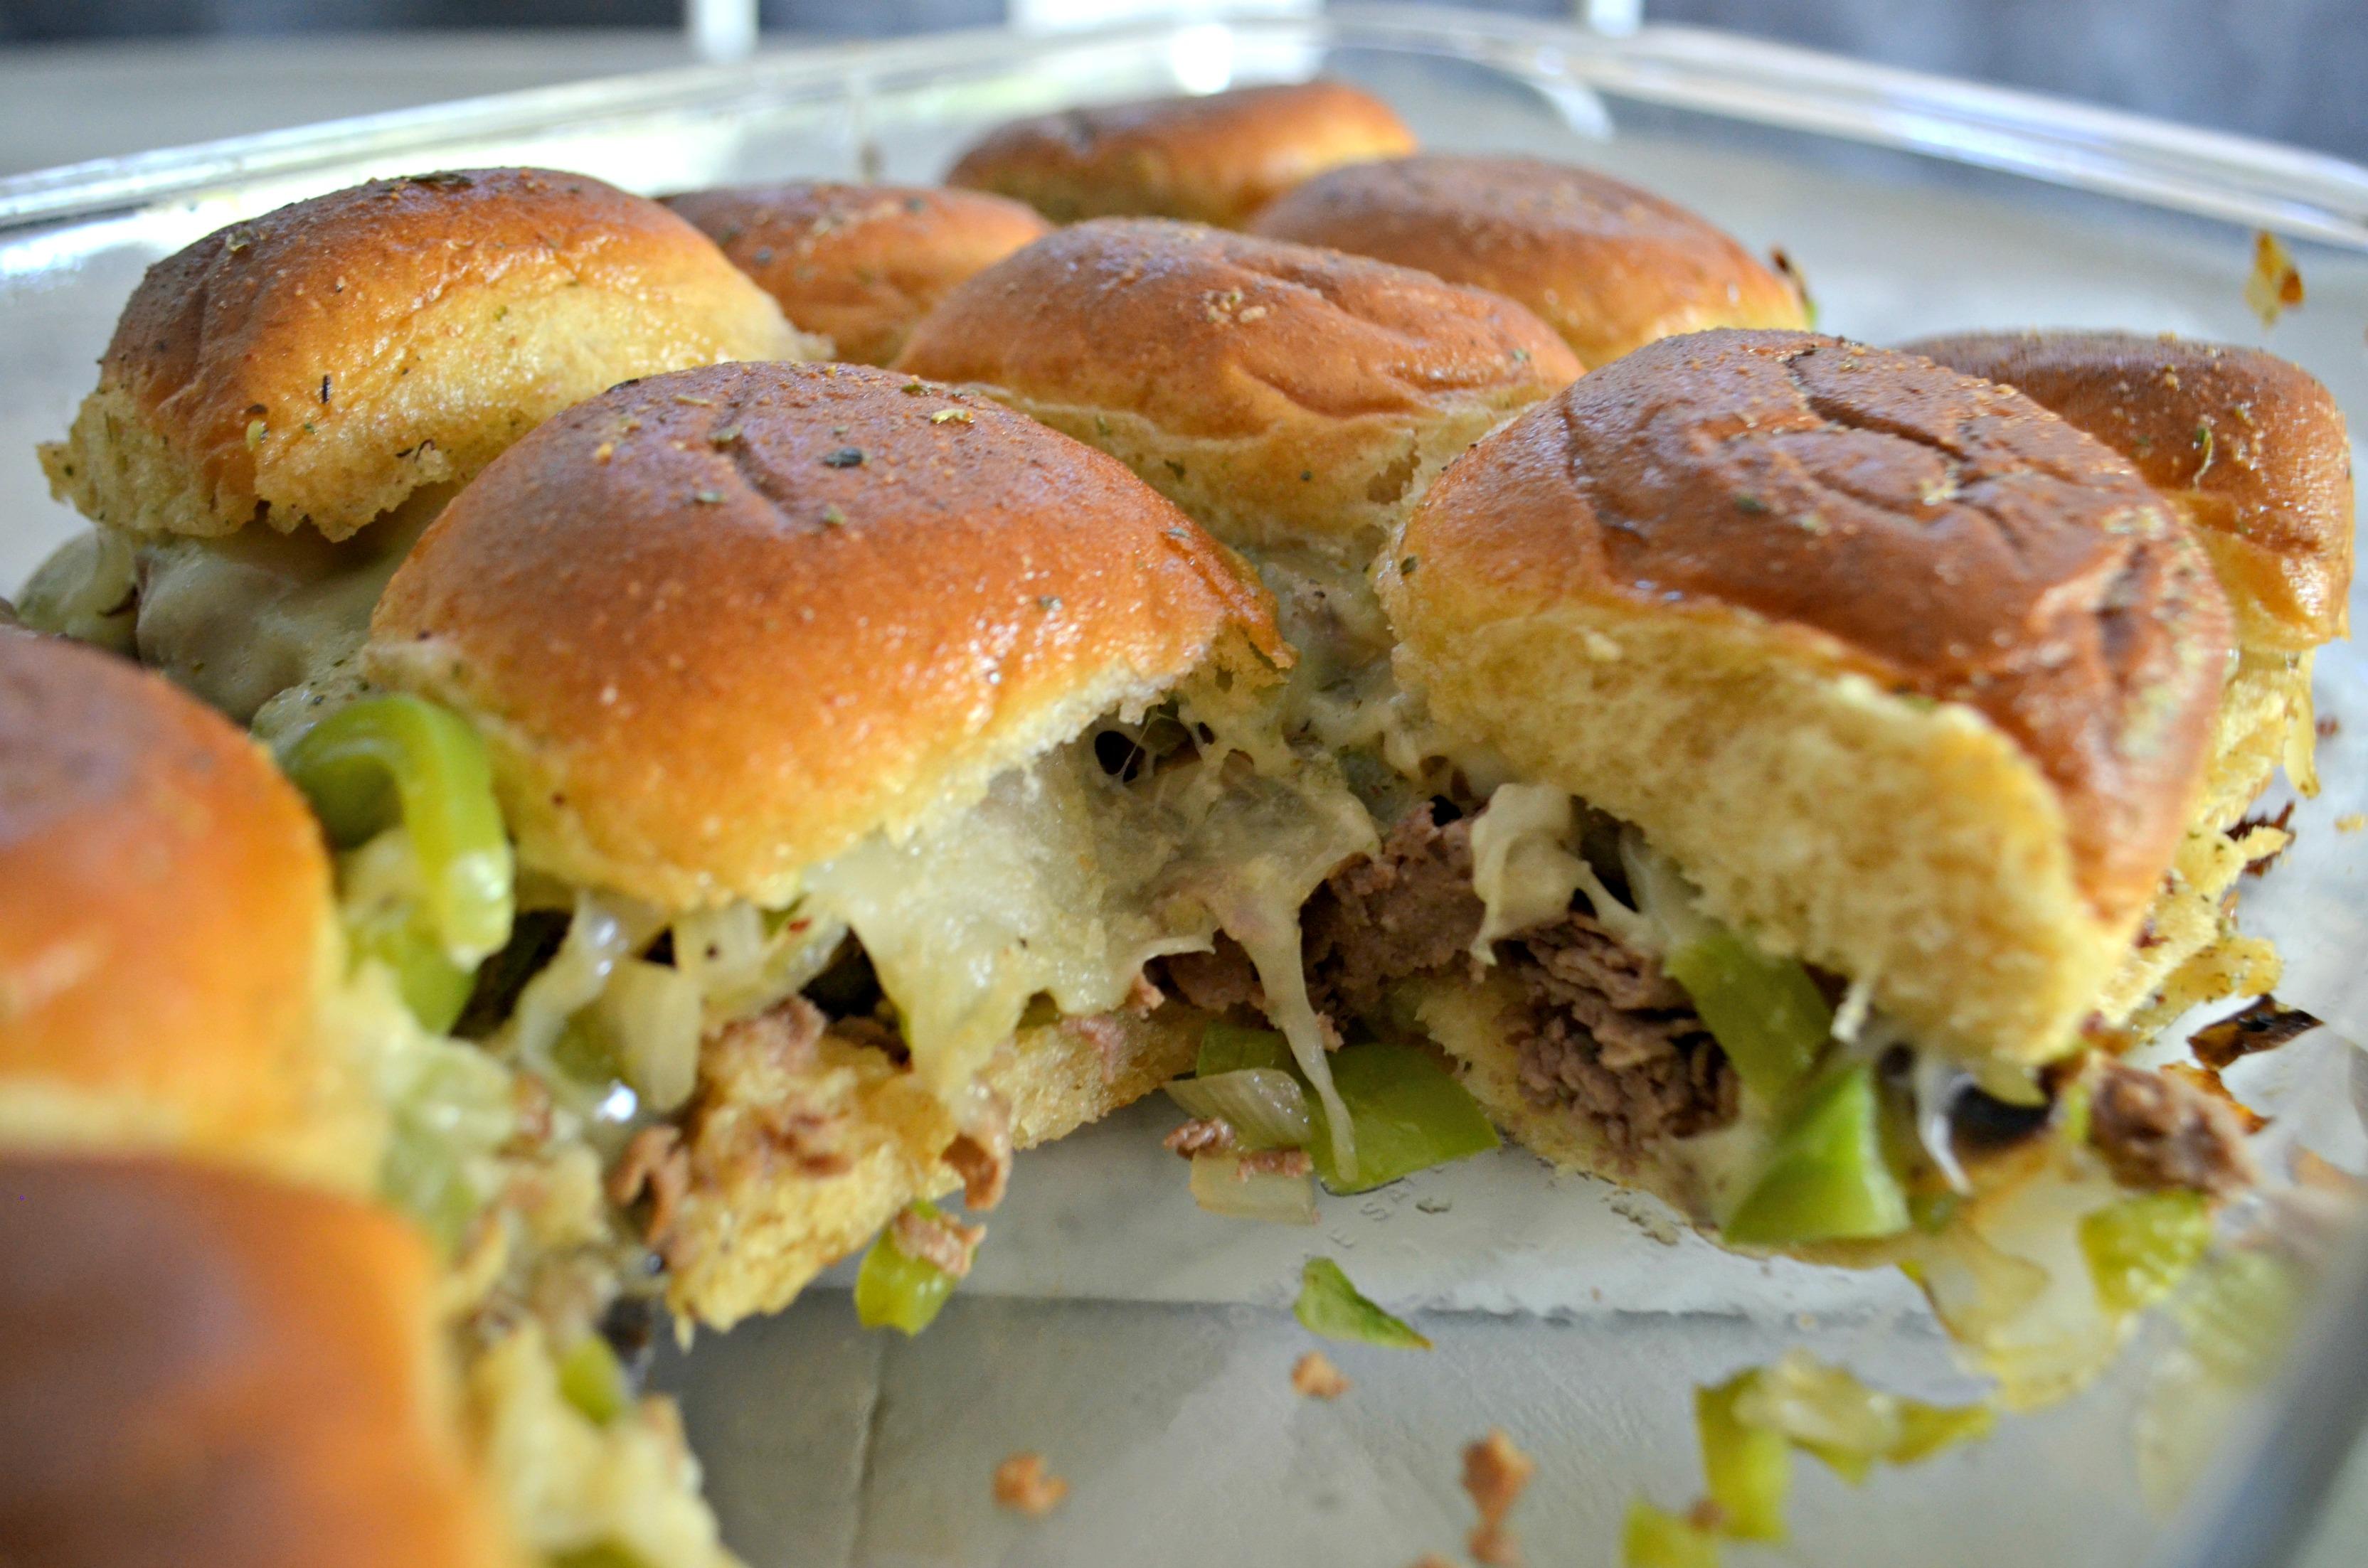 Philly Cheesesteak Sliders - sliders in the baking pan